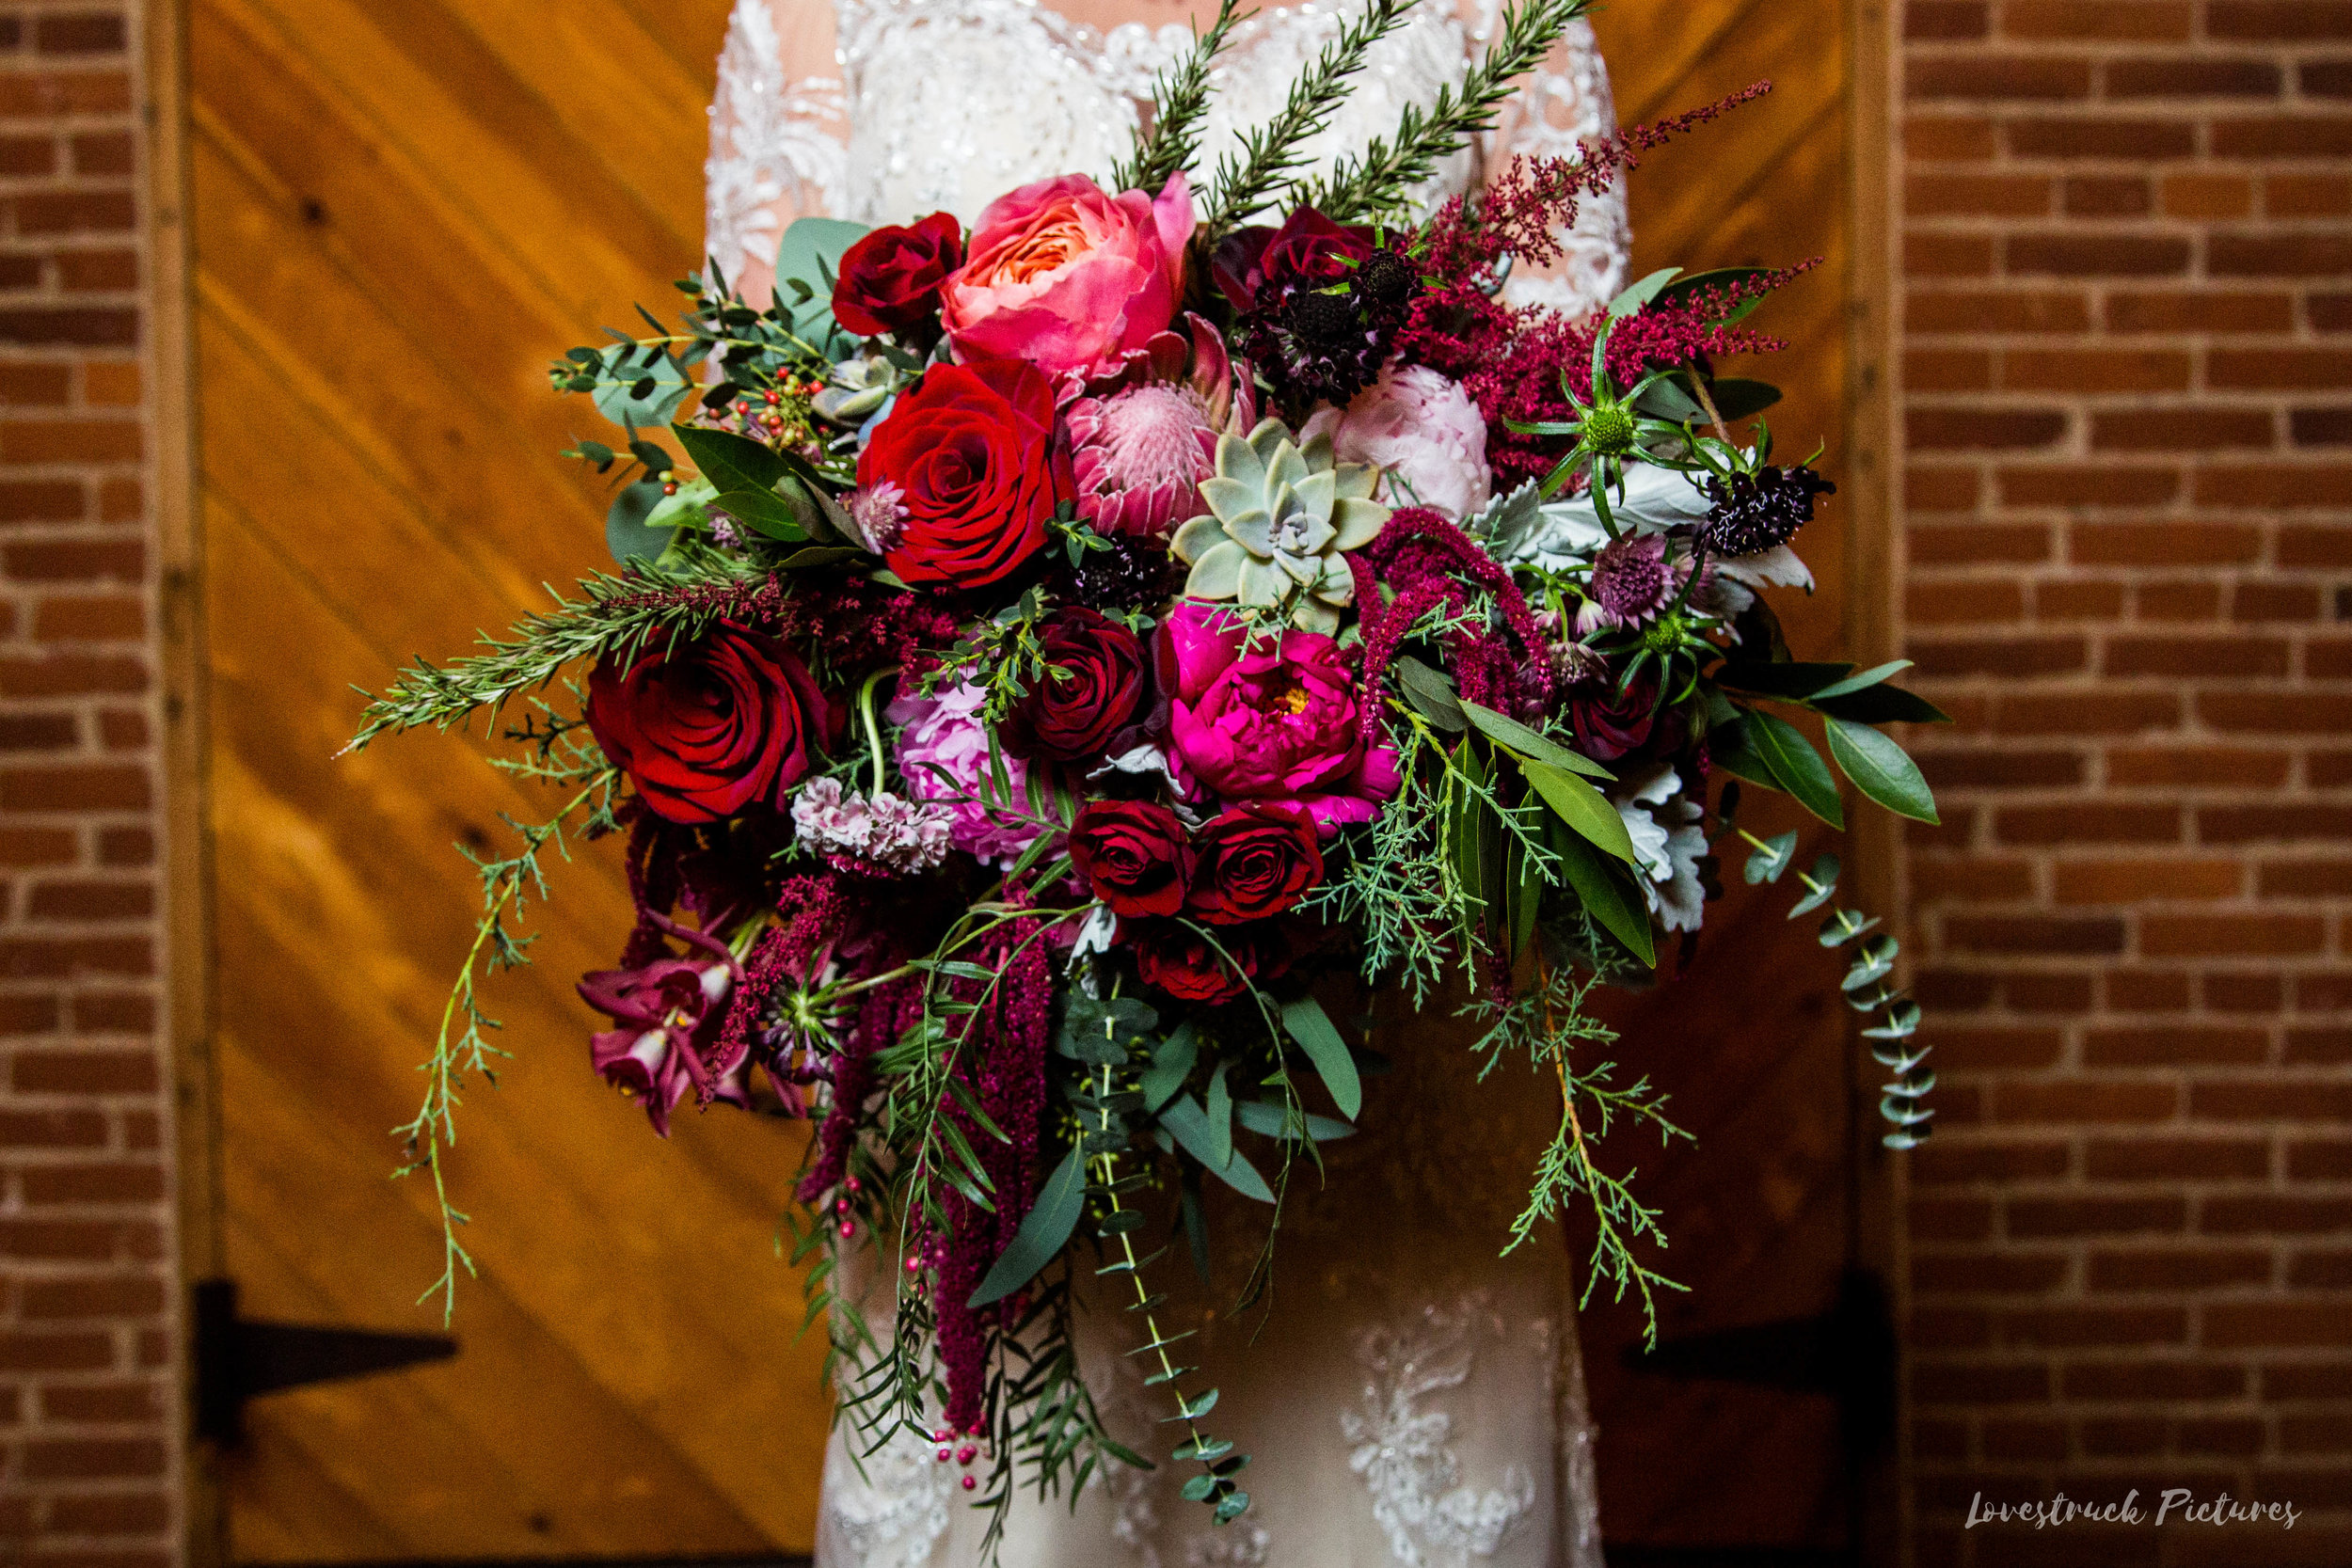 CORK_FACTORY_WEDDING_LANCASTER--269.jpg